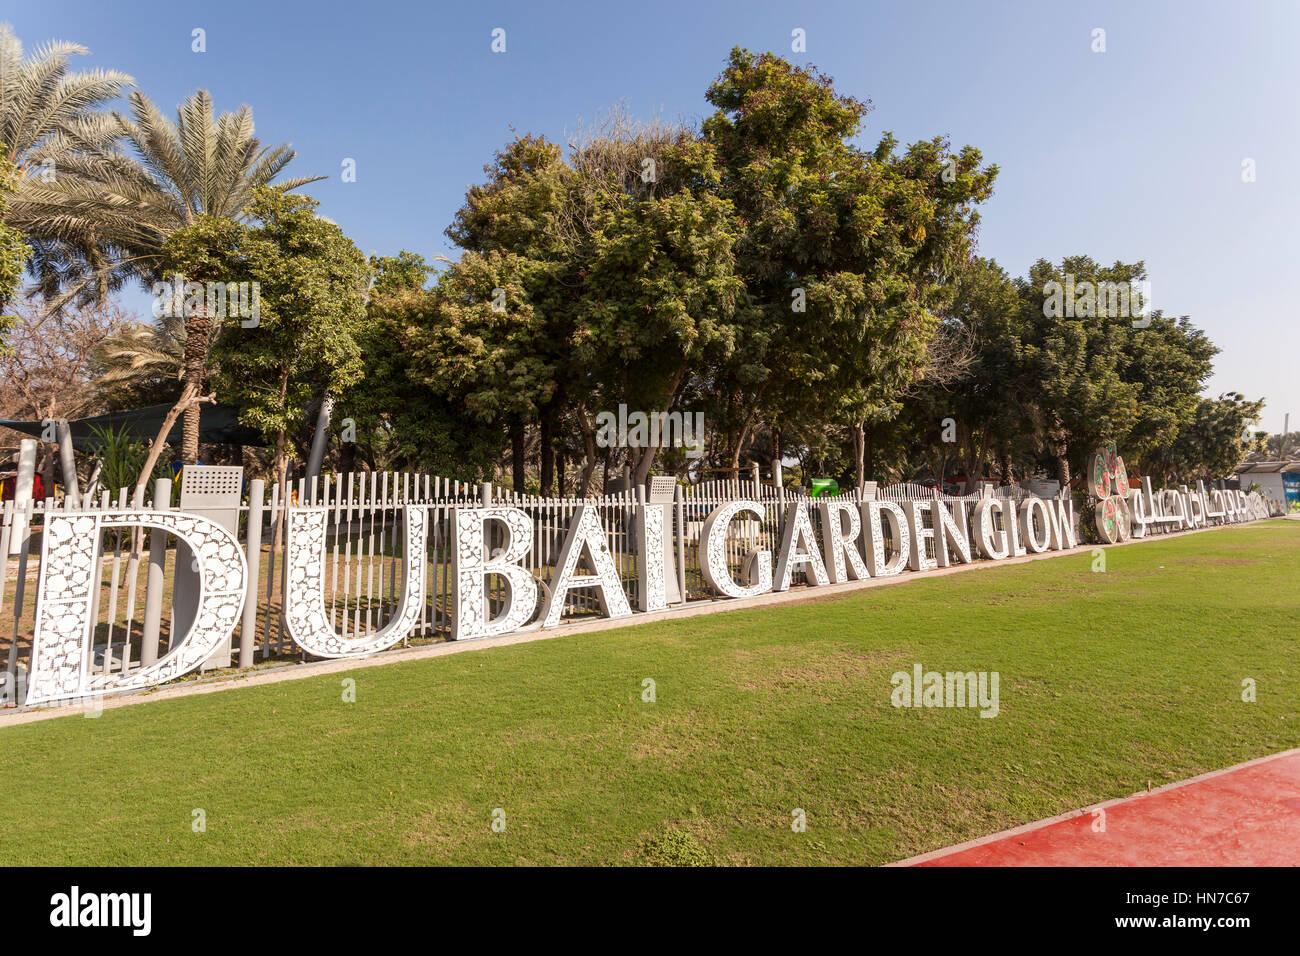 DUBAI, UAE - DEC 6, 2016: The Dubai Garden Glow - theme park for ...